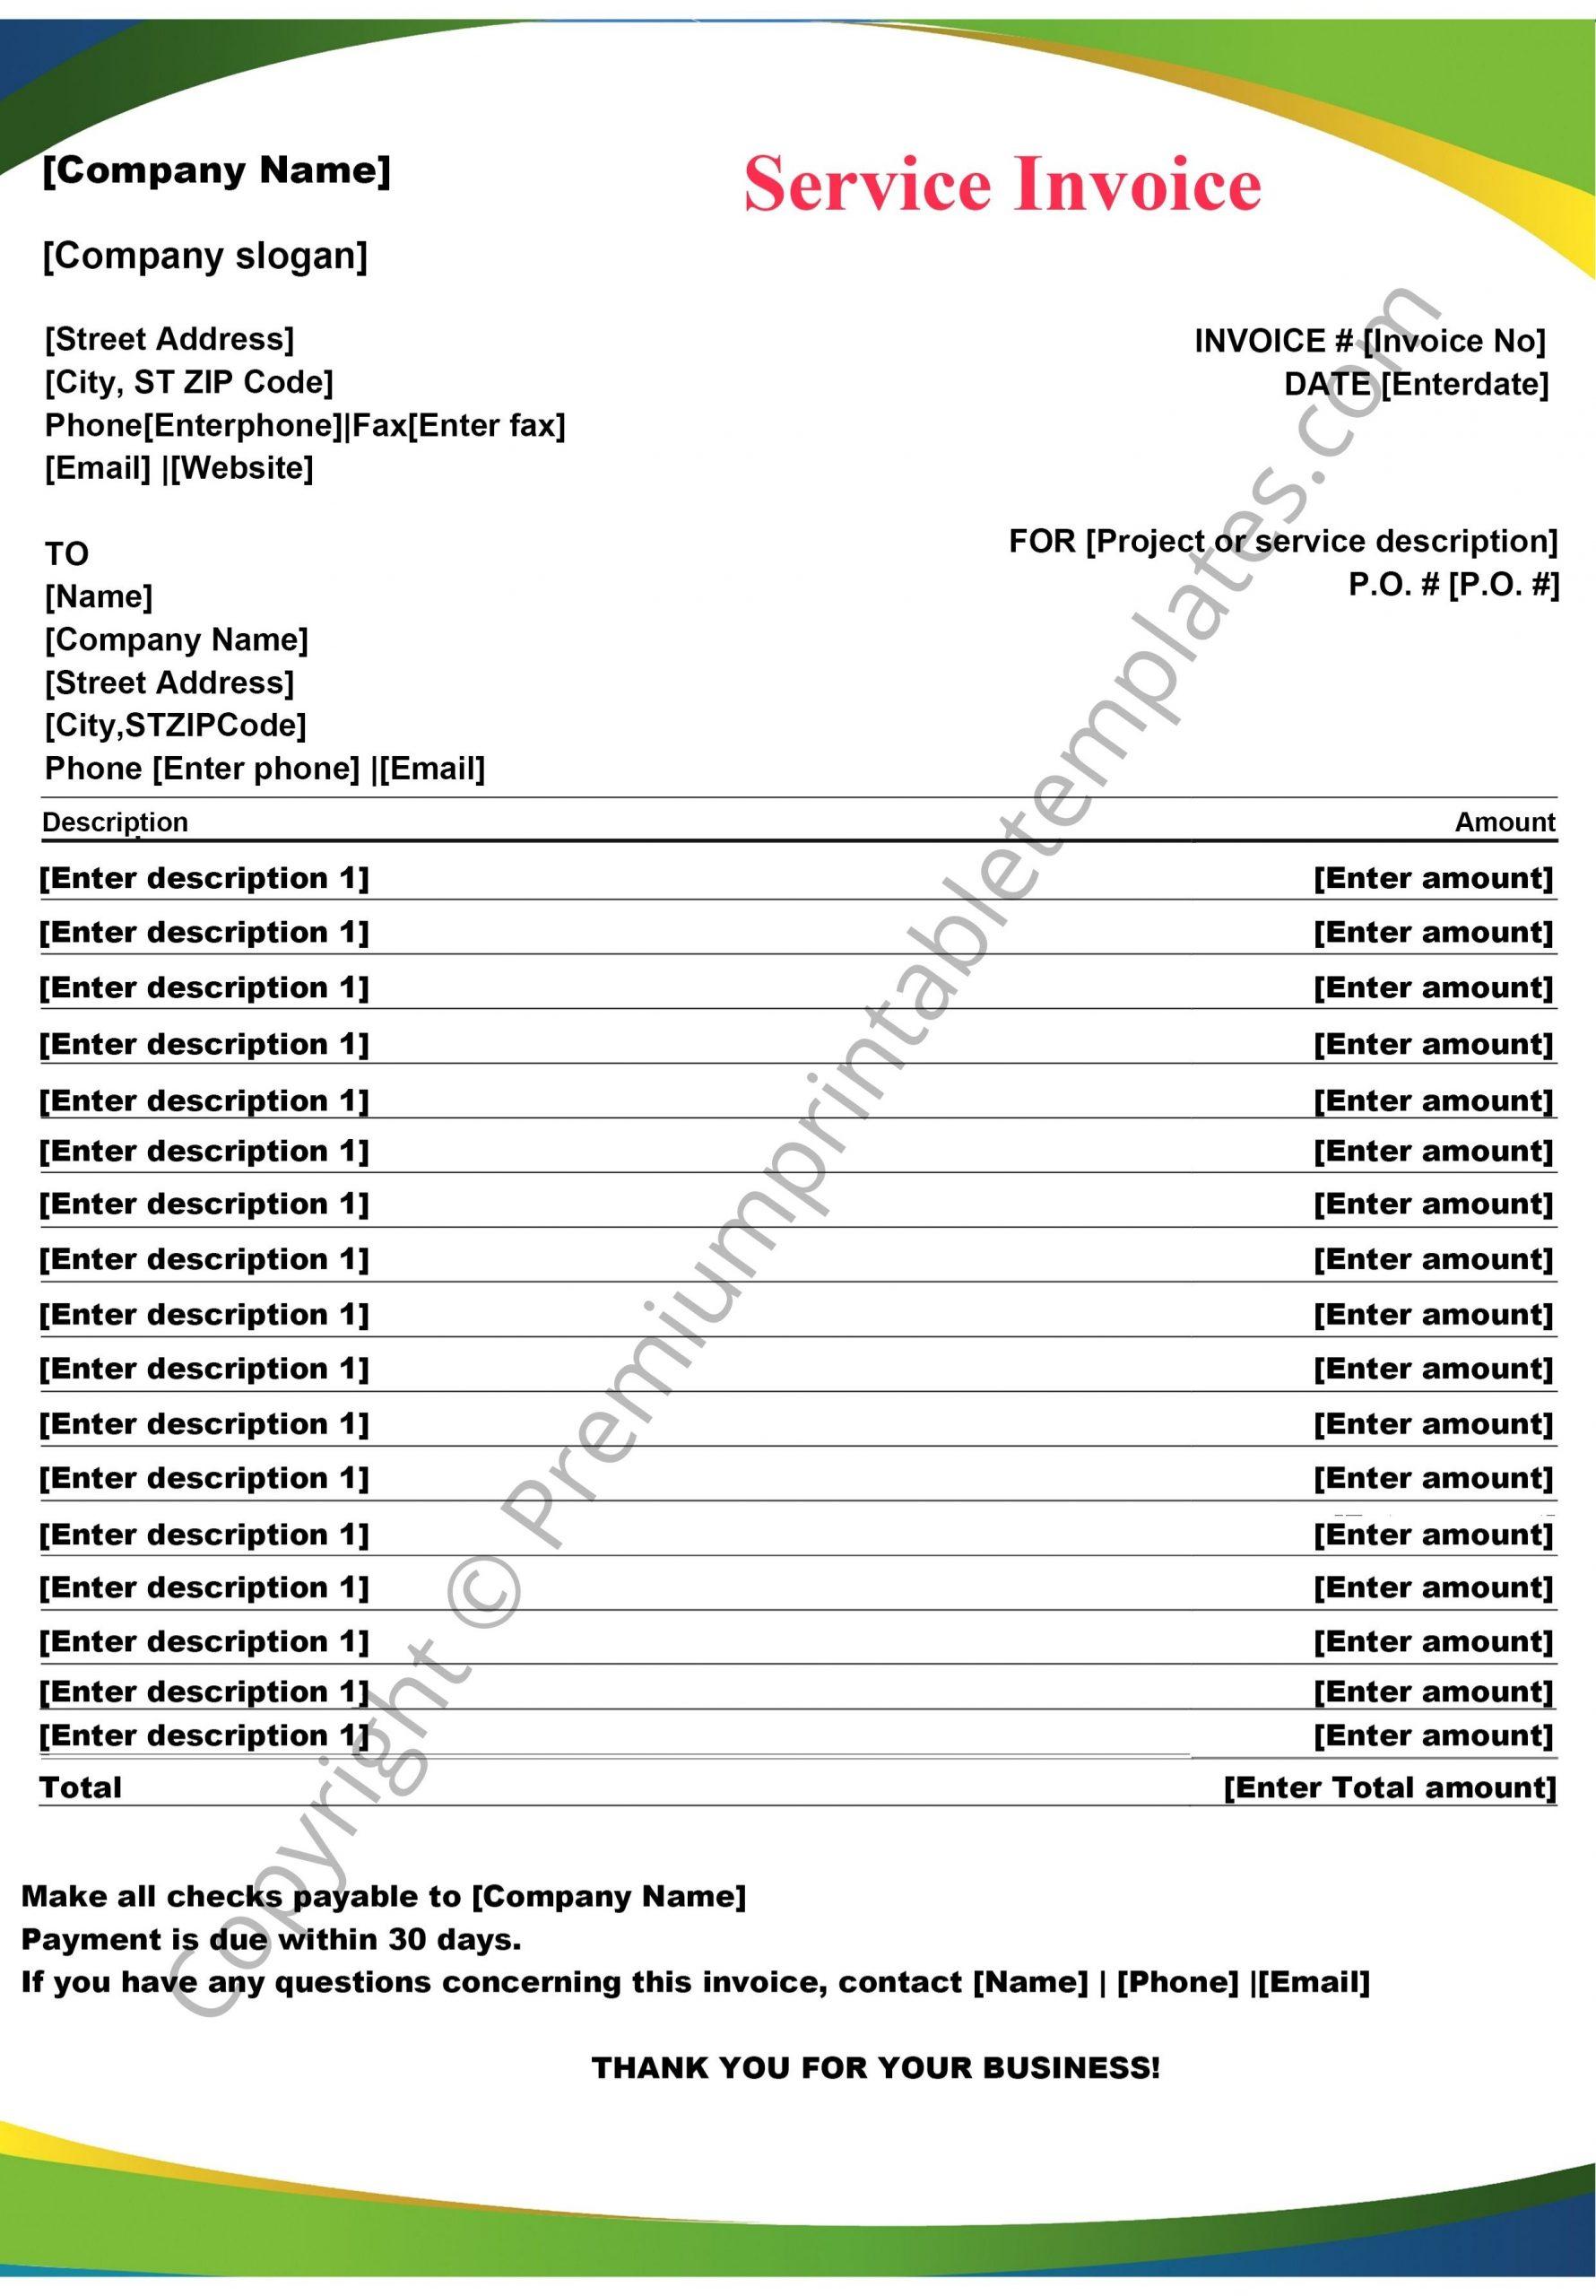 Service Invoice Template Invoice Pack Of 5 Premium Printable Templates